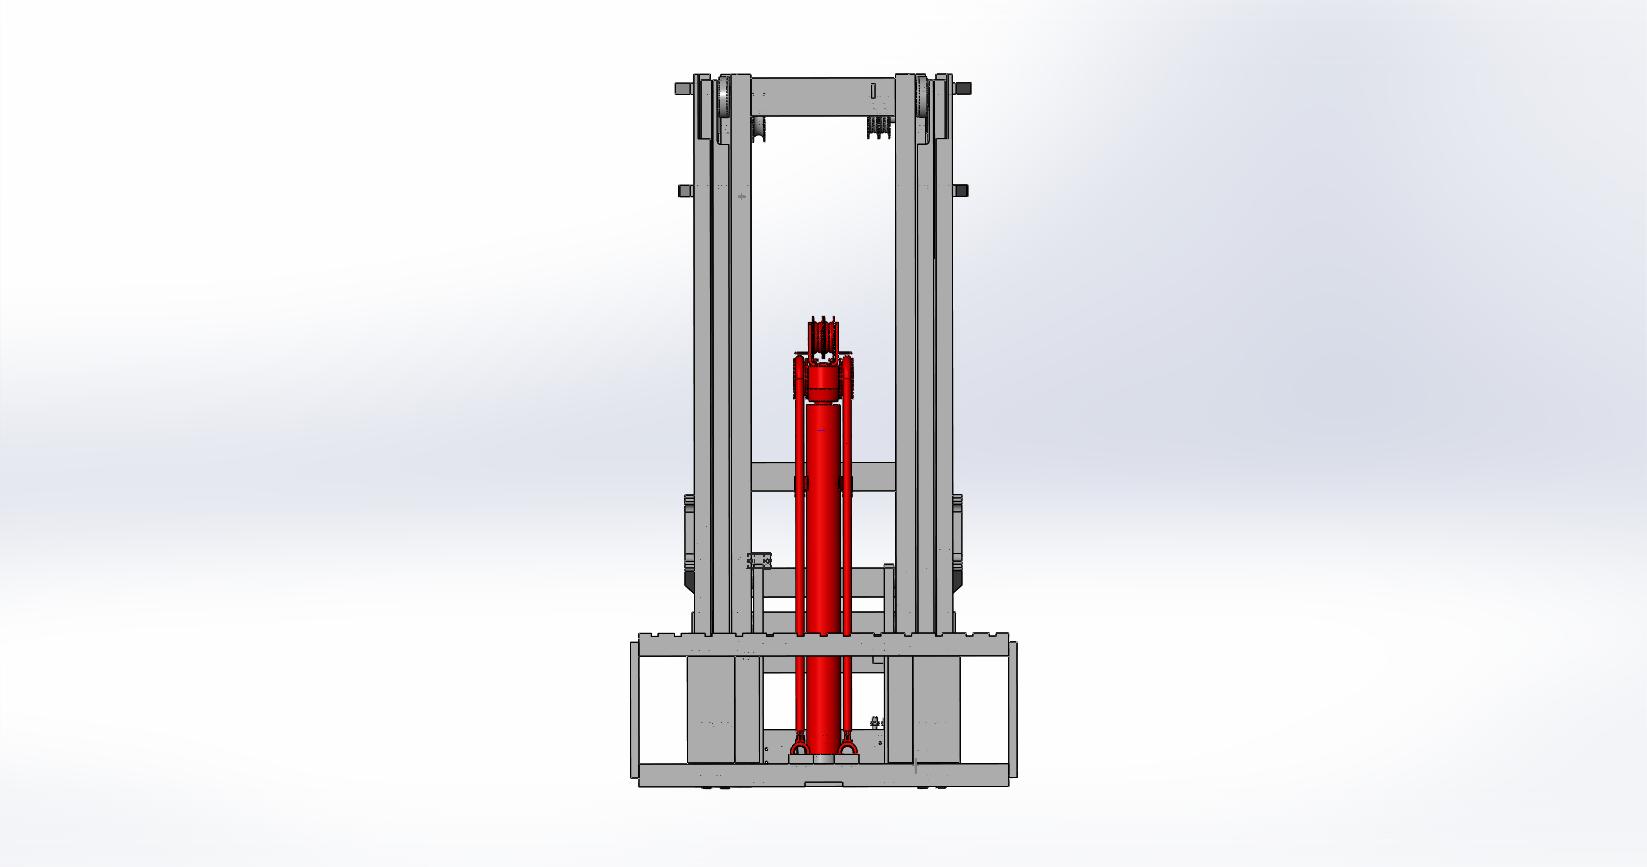 Axon Forklift: Three Stage Mast-4